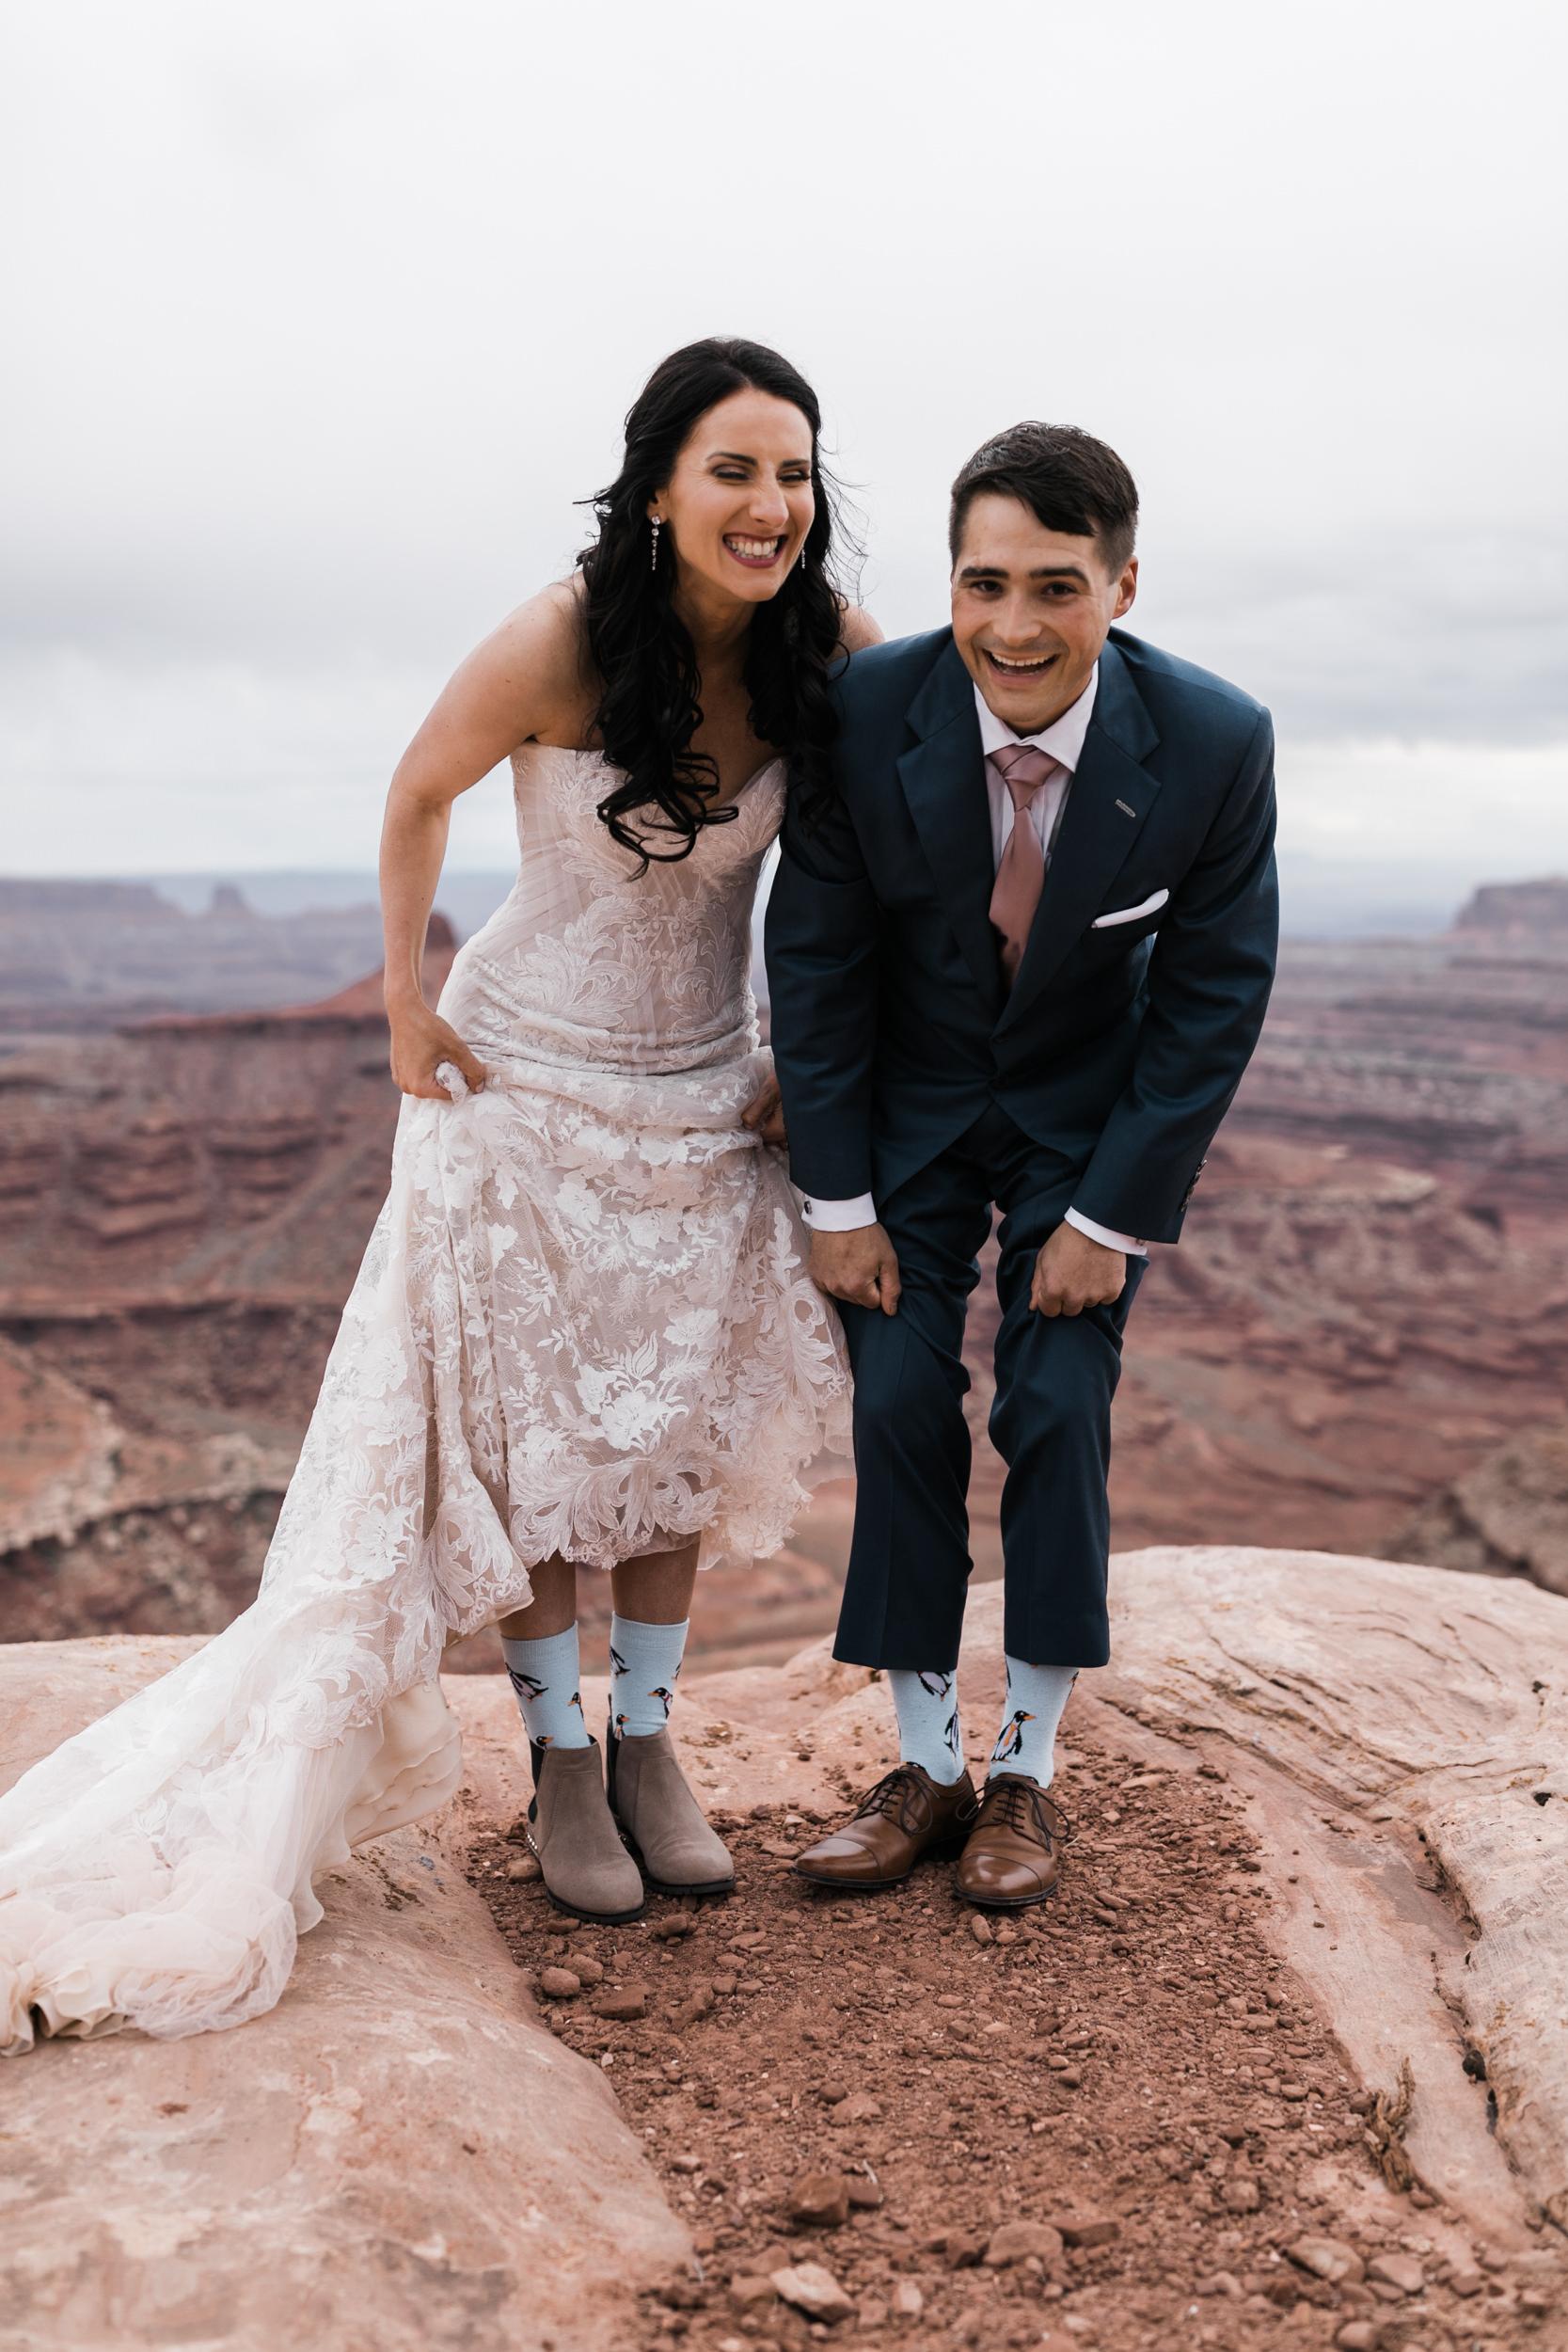 Jeep-Wedding-Moab-Utah-Hearnes-Adventure-Elopement-Photography-53.jpg